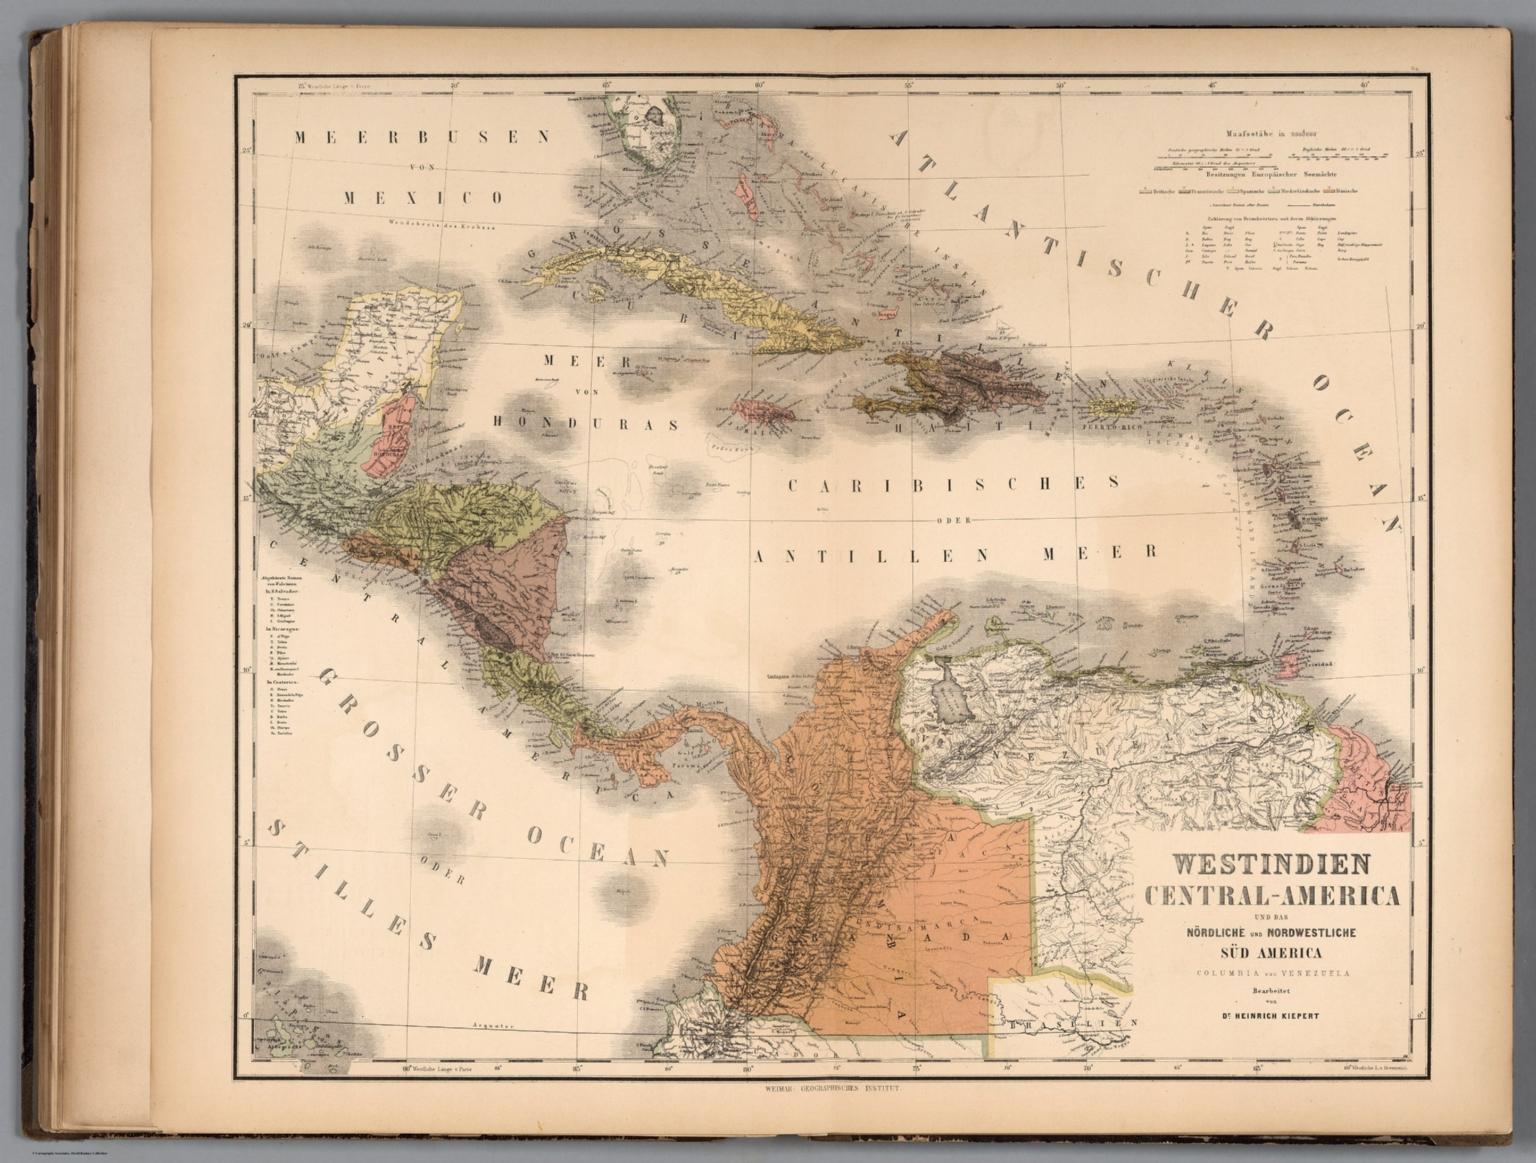 West Ins. Central America. Colombia. Venezuela. - David ... Map Of Central America Venezuela on america map panama, america map colorado, america map grenada, america map spain, america map mississippi, america map el salvador, america map uruguay, america map arizona, america map italy, america map brazil, america map jamaica, america map bahamas, america map georgia, america map texas, america map honduras, america map north america, america map philippines, america map canada,